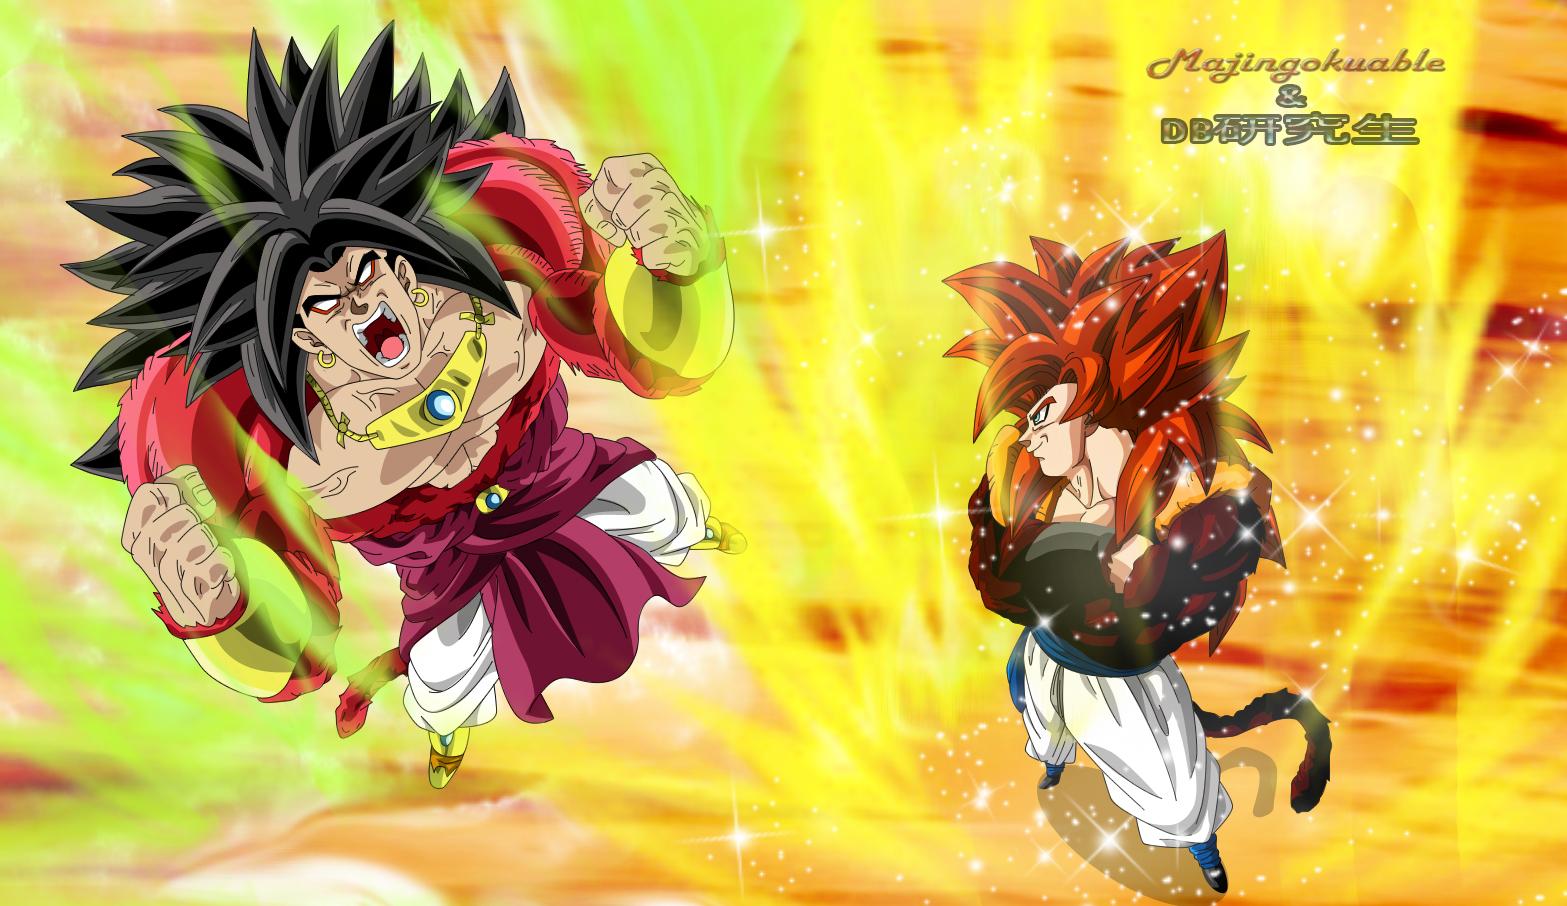 Goku Super Saiyan 7 Vs Broly